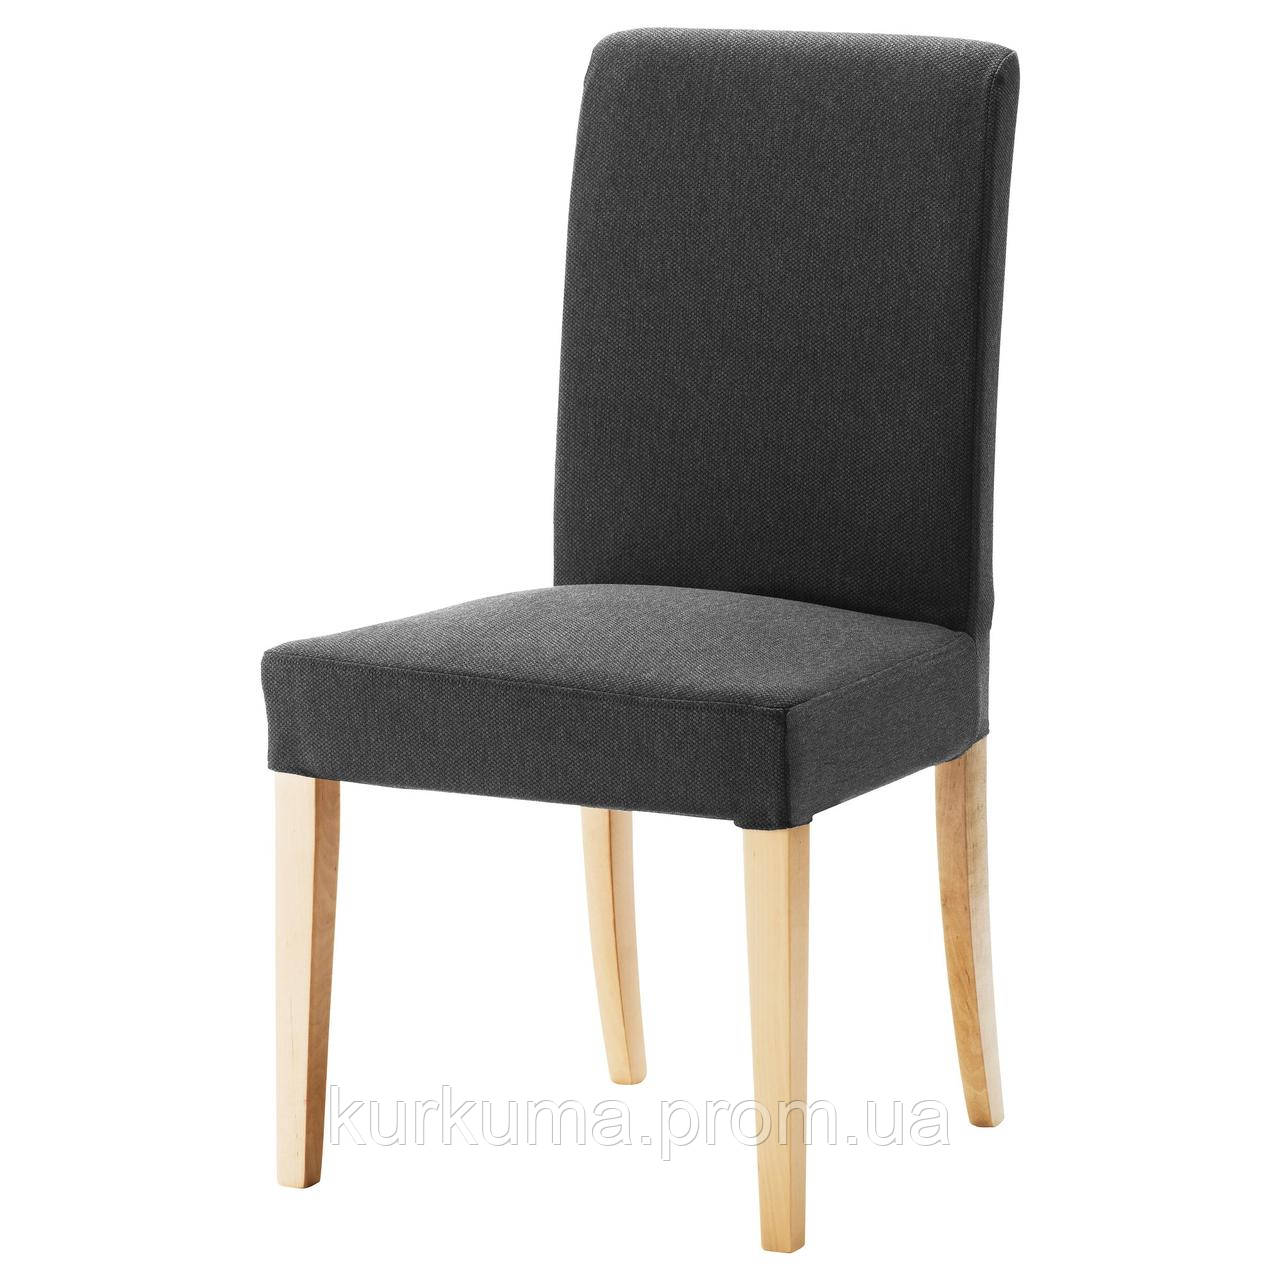 IKEA HENRIKSDAL Стул, береза, ДАНСБУ темно-серый  (999.264.50)